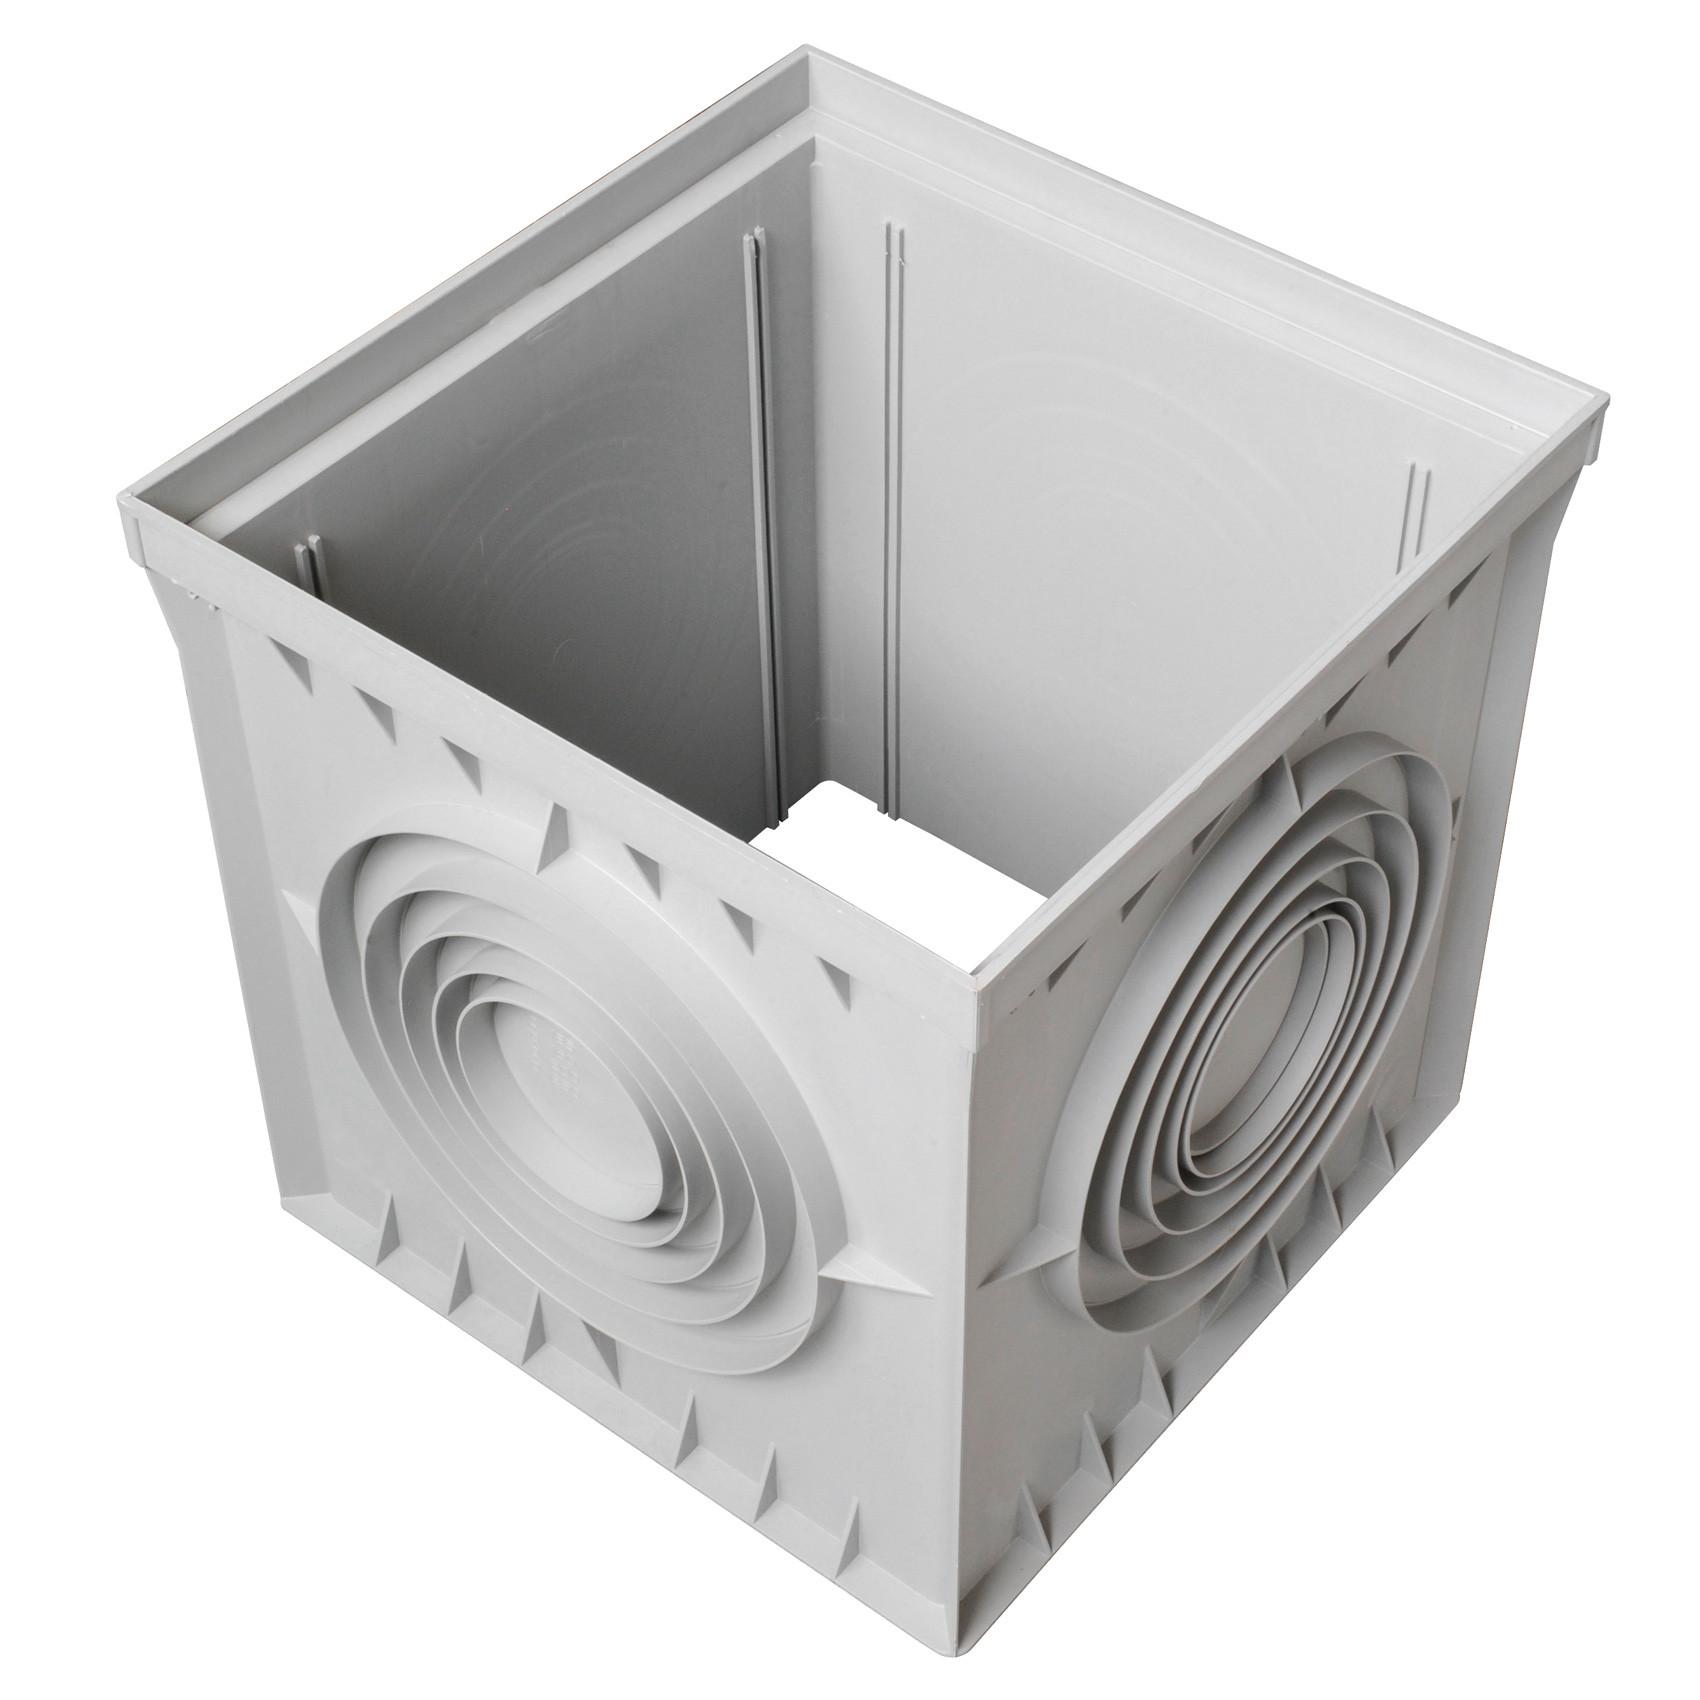 r hausse regard pvc avec sorties multidiam tres first plast anjou connectique. Black Bedroom Furniture Sets. Home Design Ideas